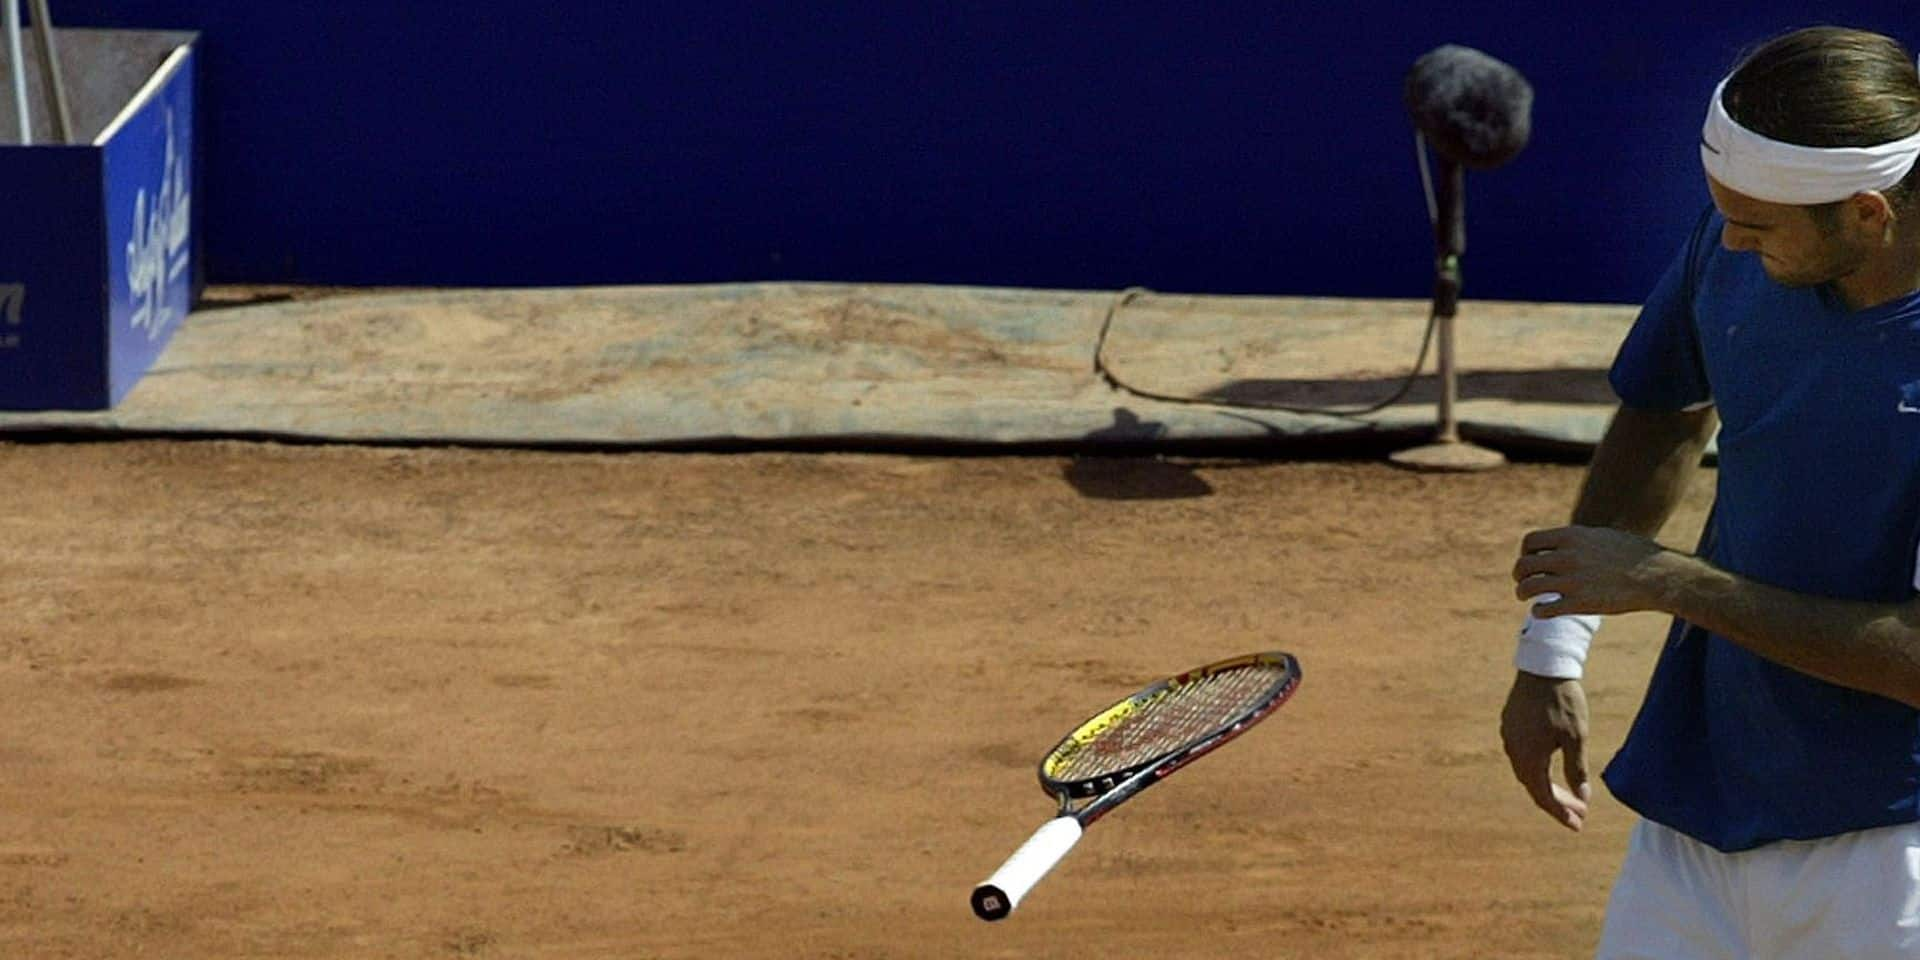 ITALY-TENNIS-FINAL